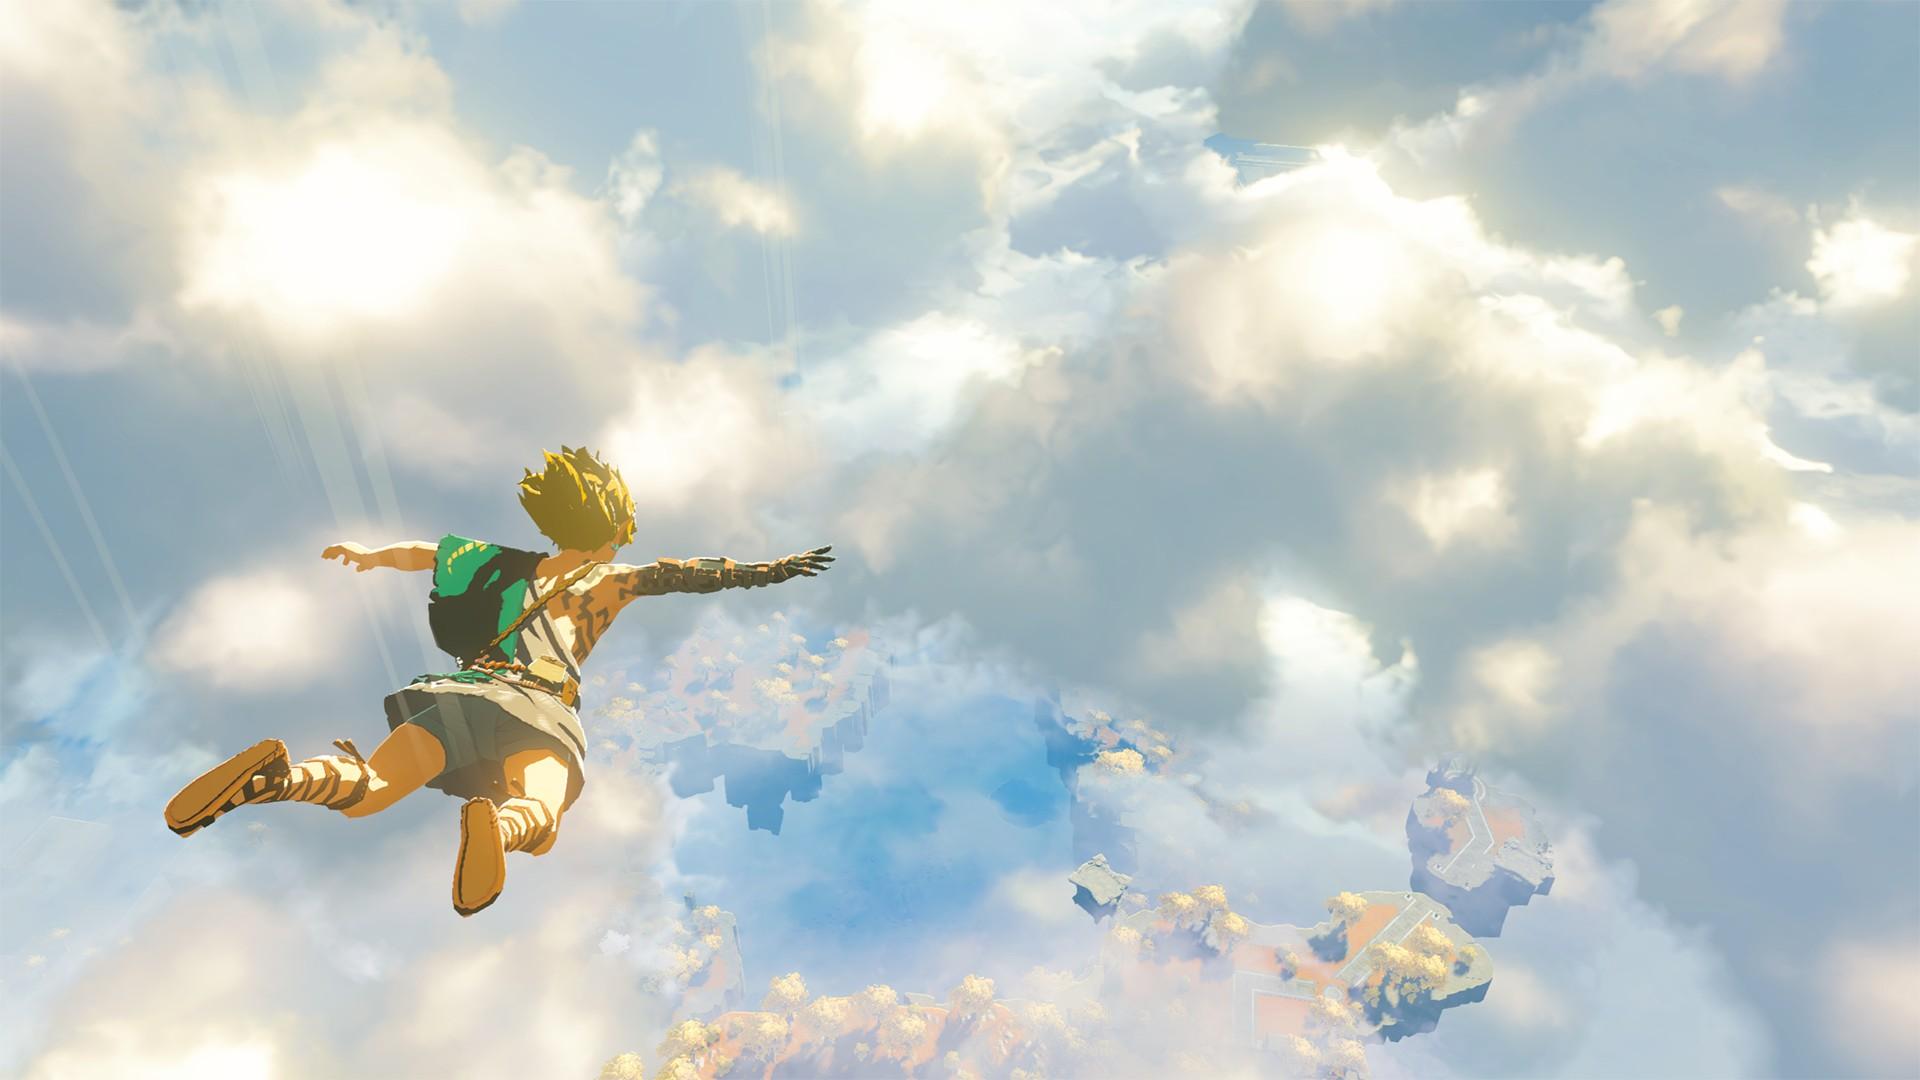 Zelda Breath of the Wild 2: Ganon, Flamethrowers, and More E3 Trailer Secrets - Den of Geek